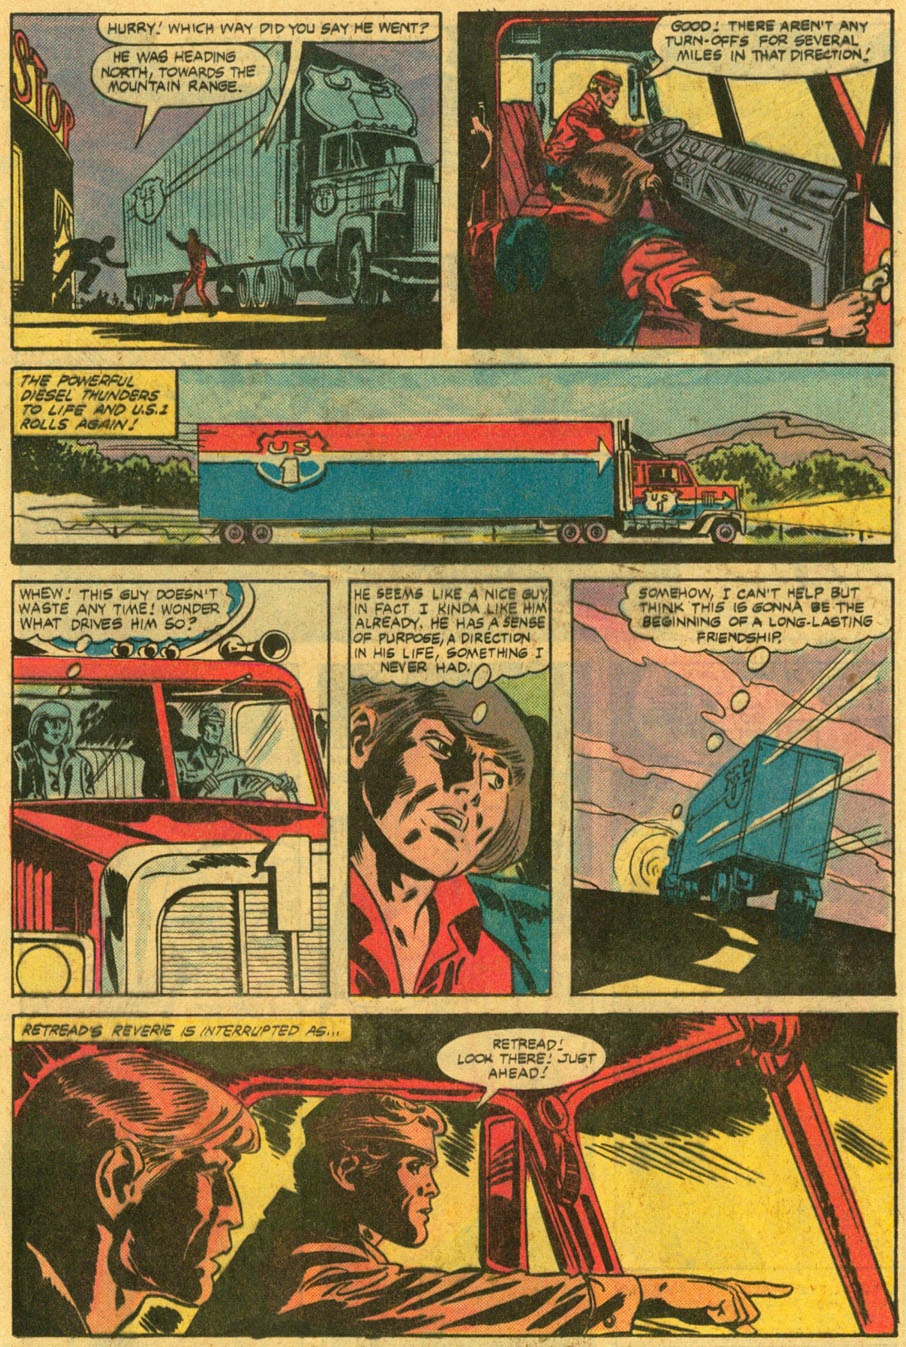 Read online U.S. 1 comic -  Issue #3 - 11